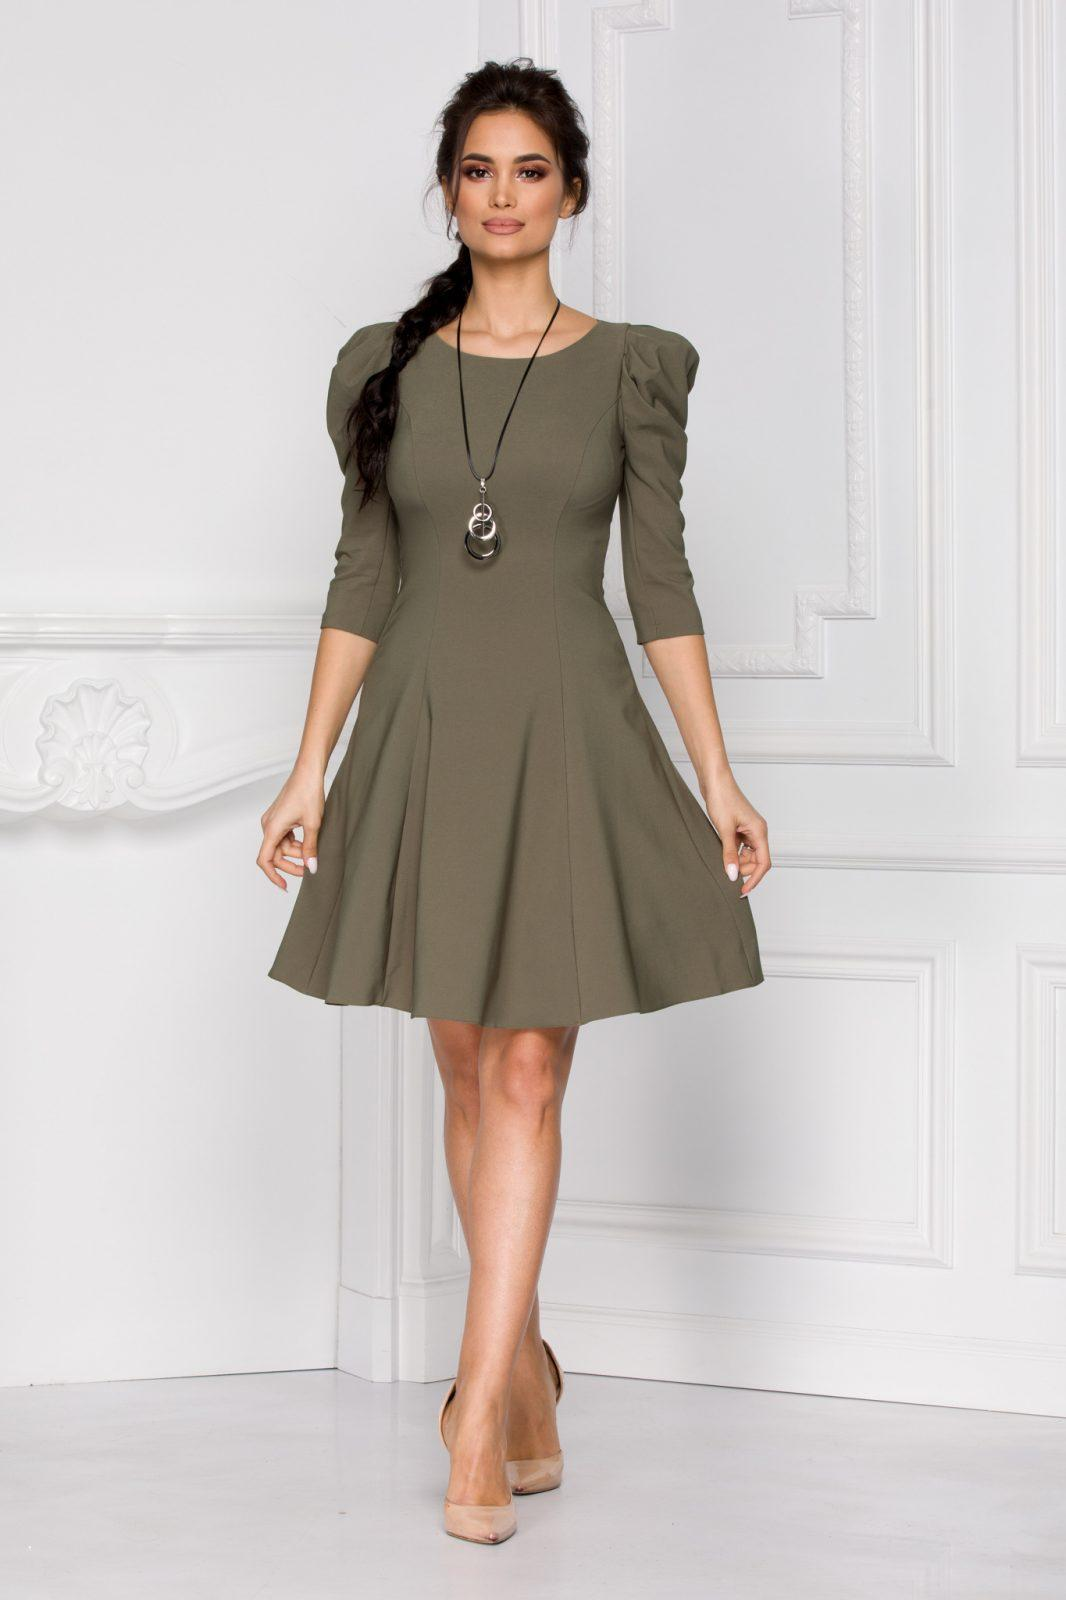 Maya Χακί Φόρεμα 5407